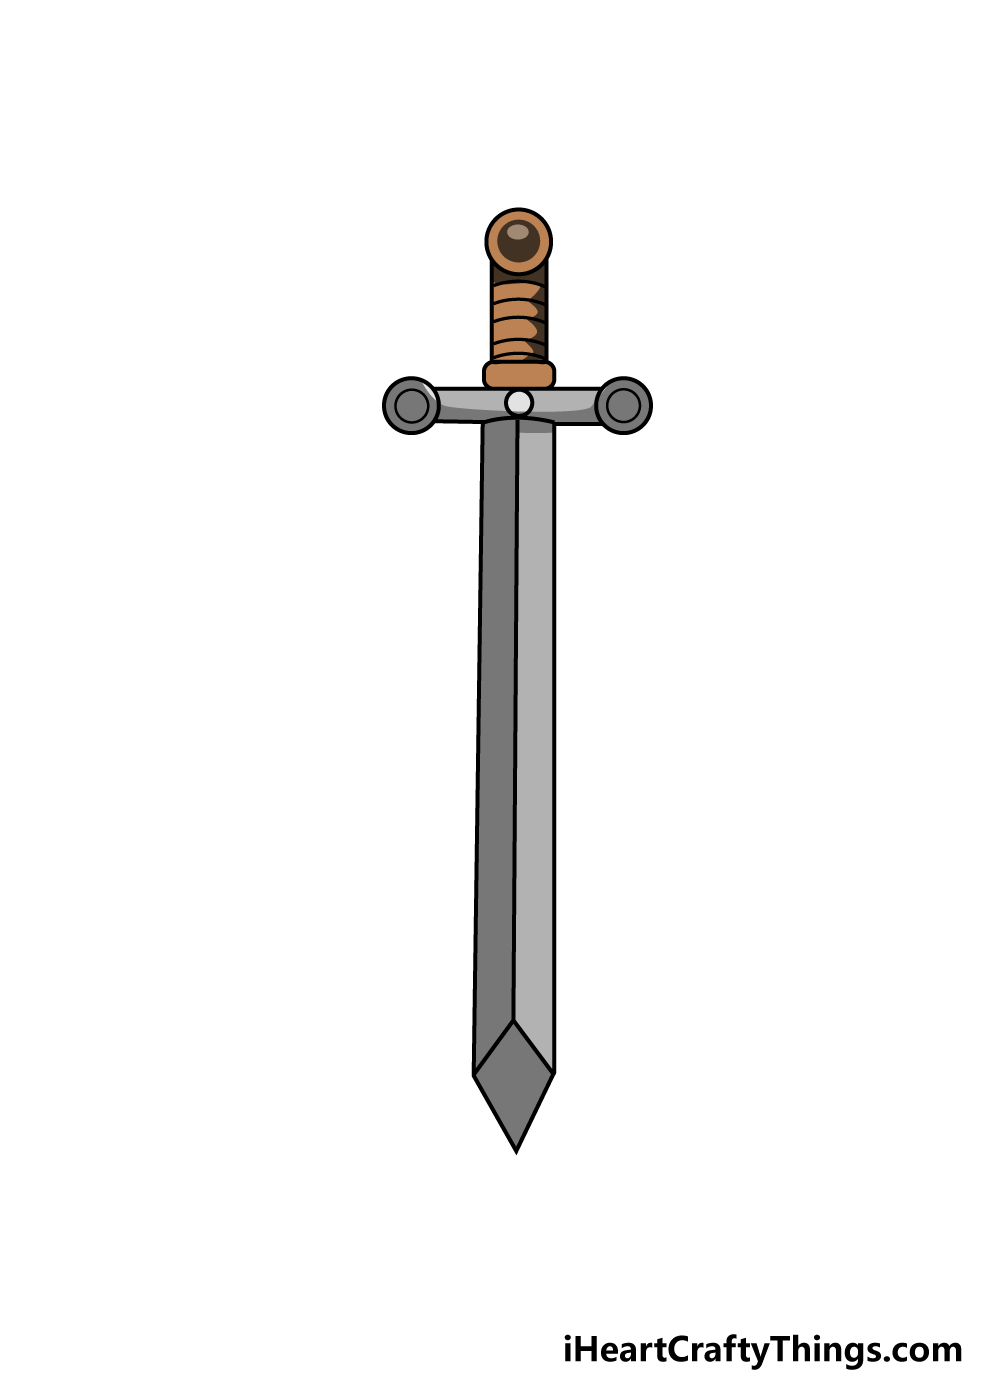 sword drawing step 7